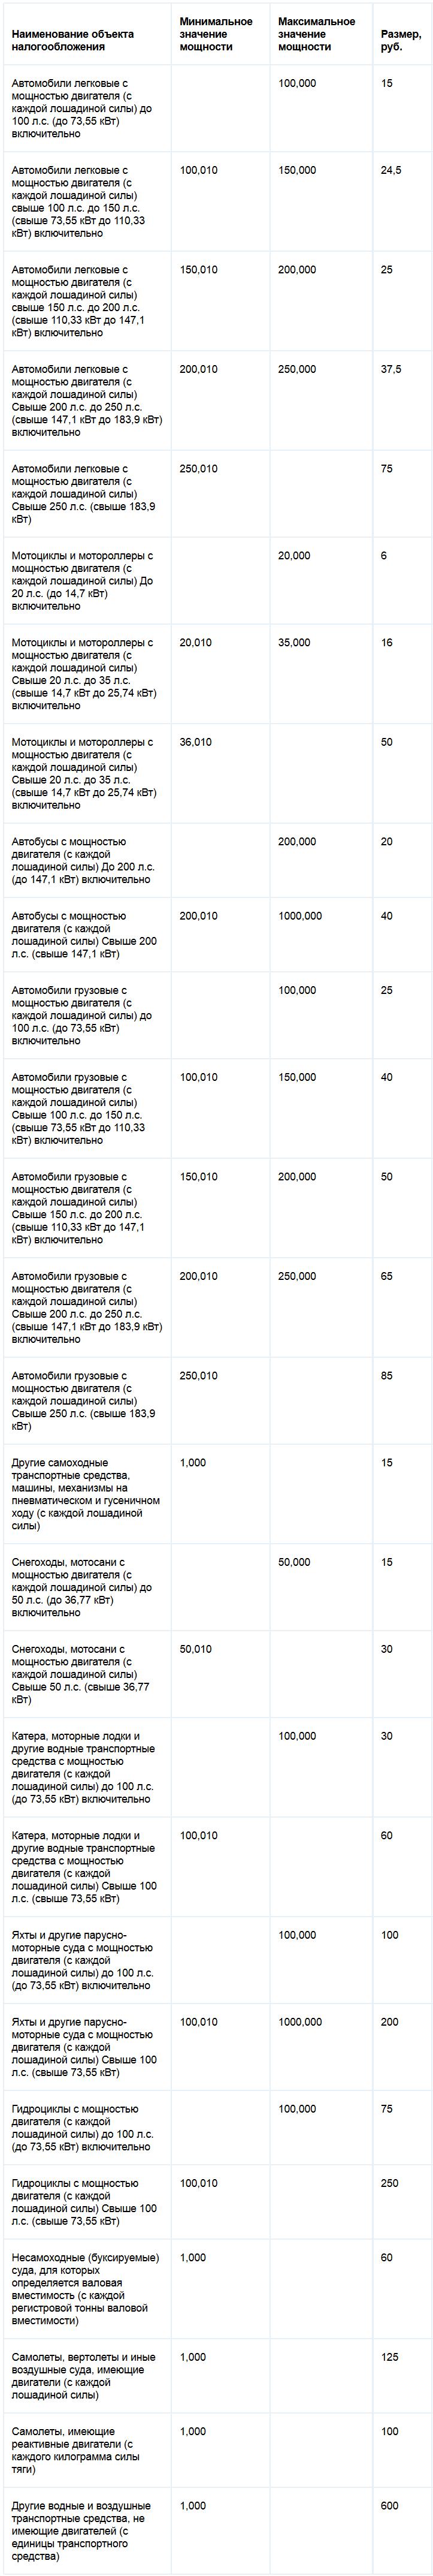 Ставки транспортного налога Ямало-Ненецкого автономного округа